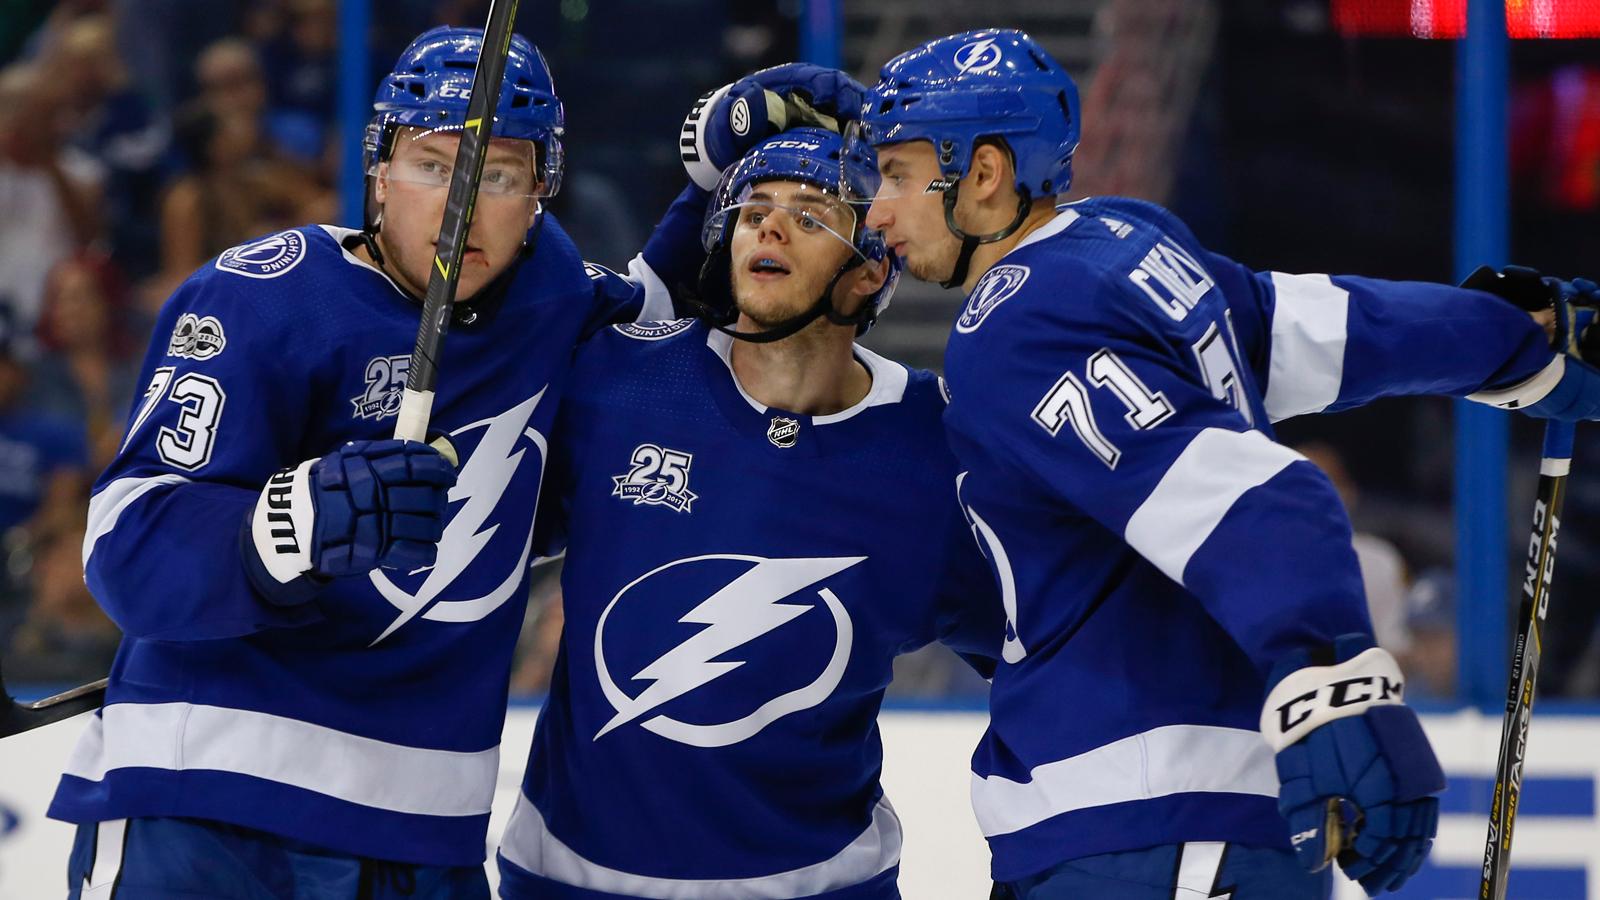 Adam Erne scores, Lightning drop preseason game to Hurricanes